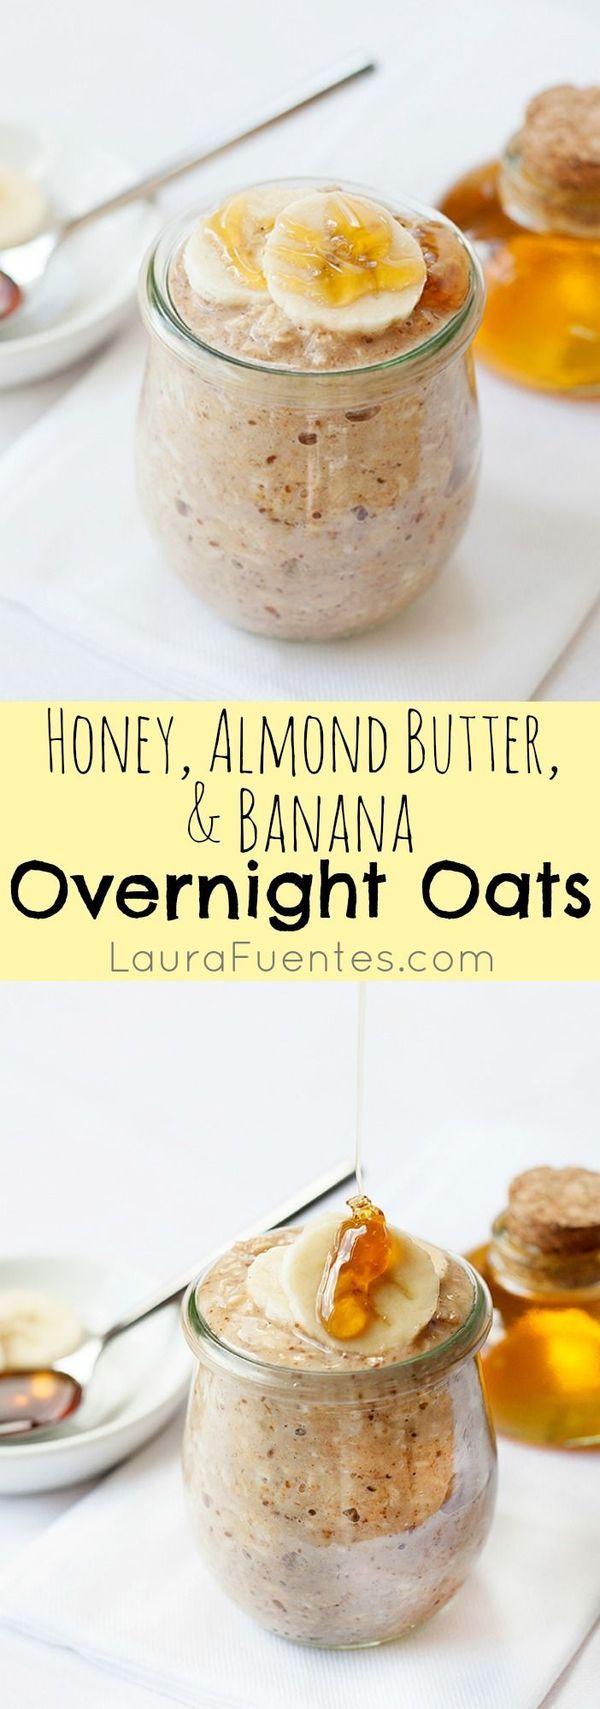 Honey, Almond Butter, and Banana Overnight Oats